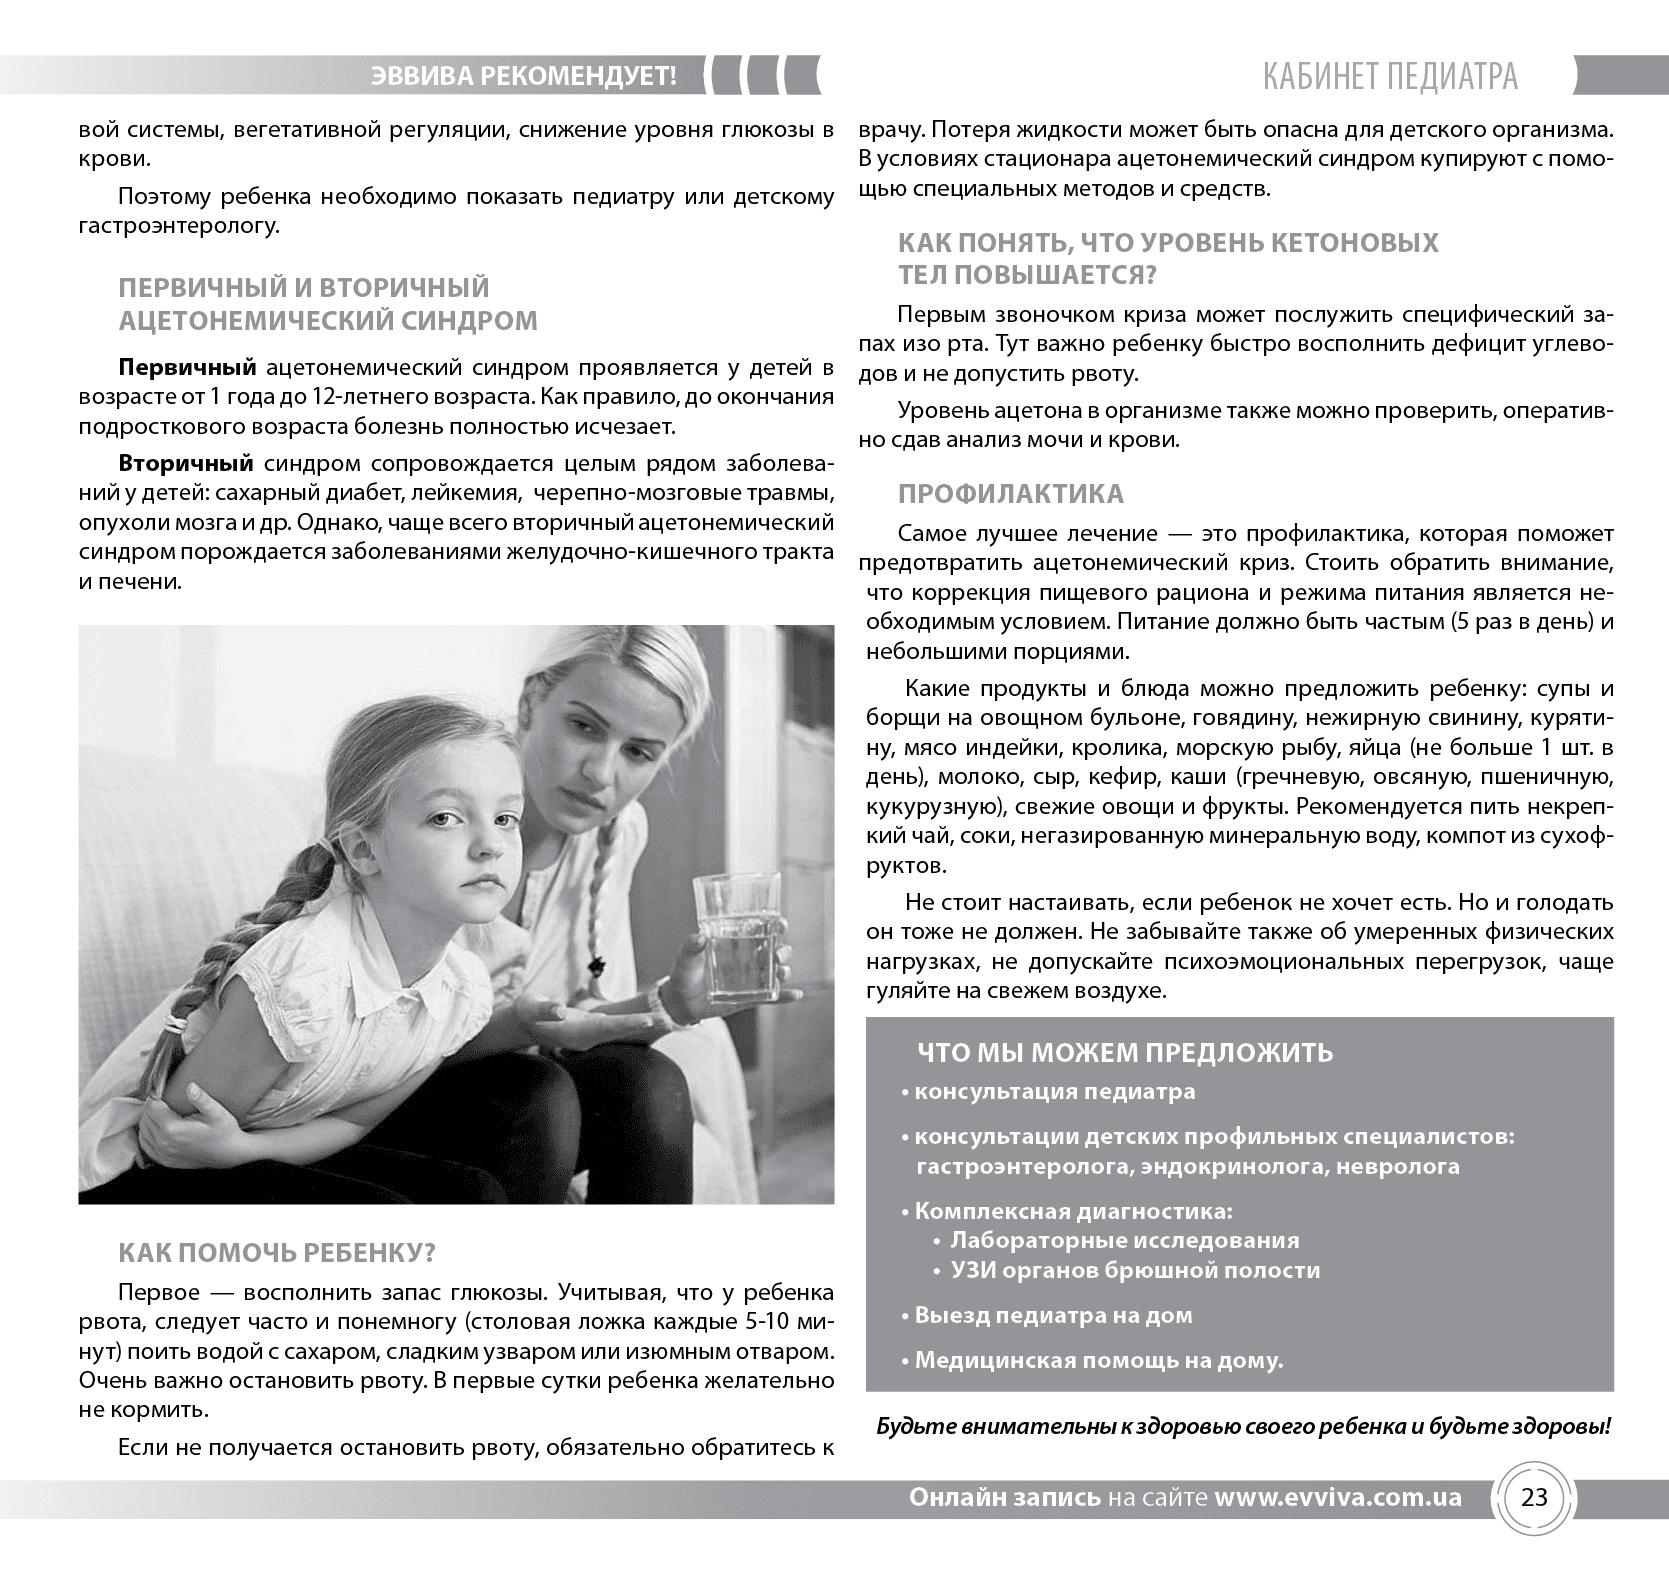 evviva-zhurnal-118-page23